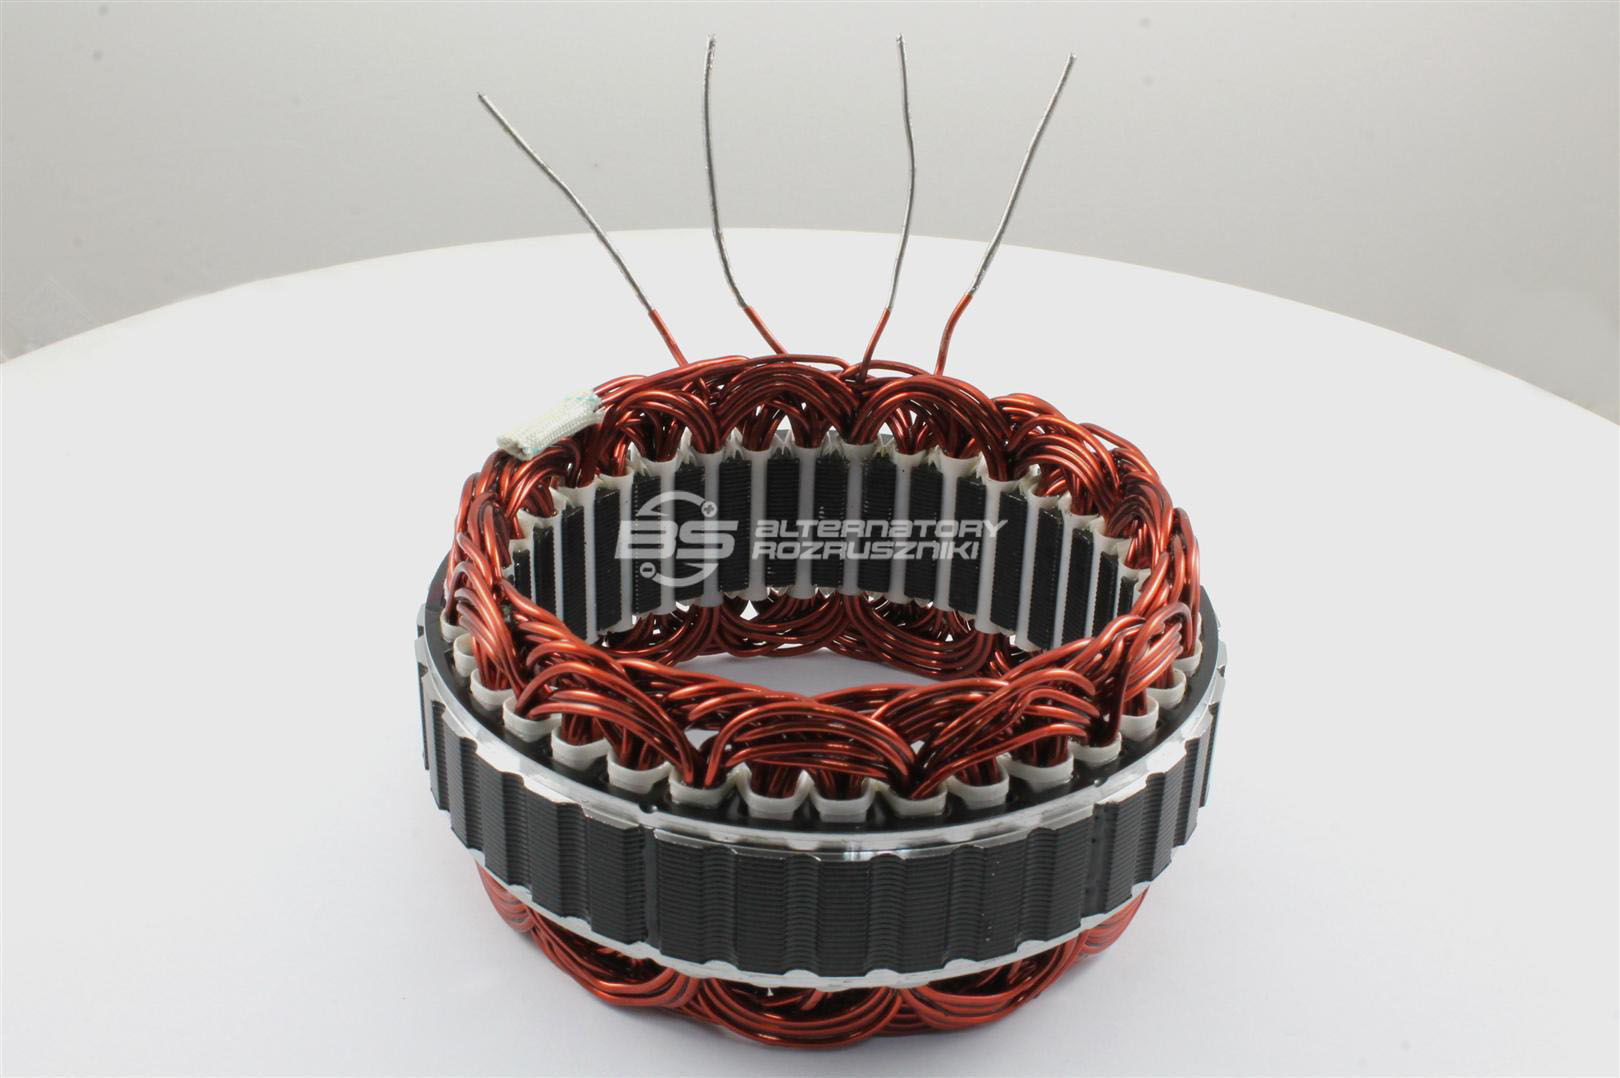 Stojan IA8226 Uzwojenie alternatora